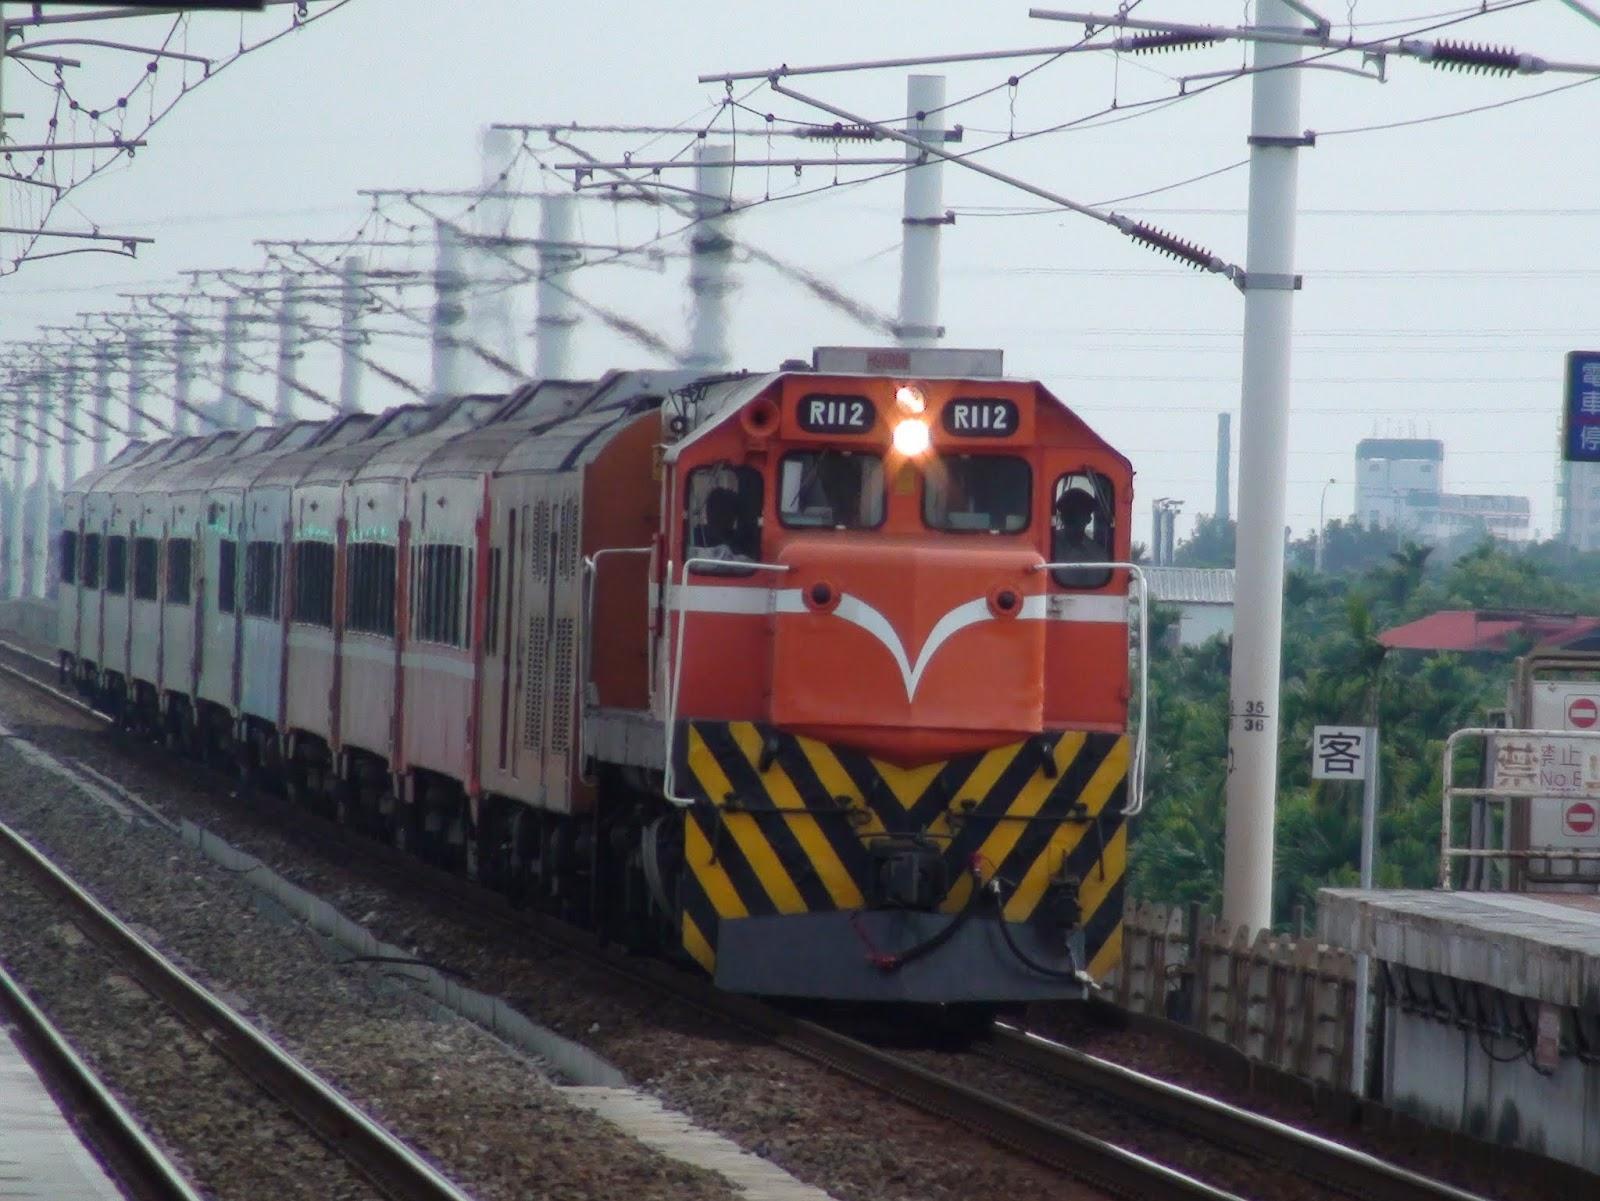 Blair's 鐵道攝影: R112柴電機車 / TRA R112 Diesel-electric Locomotive